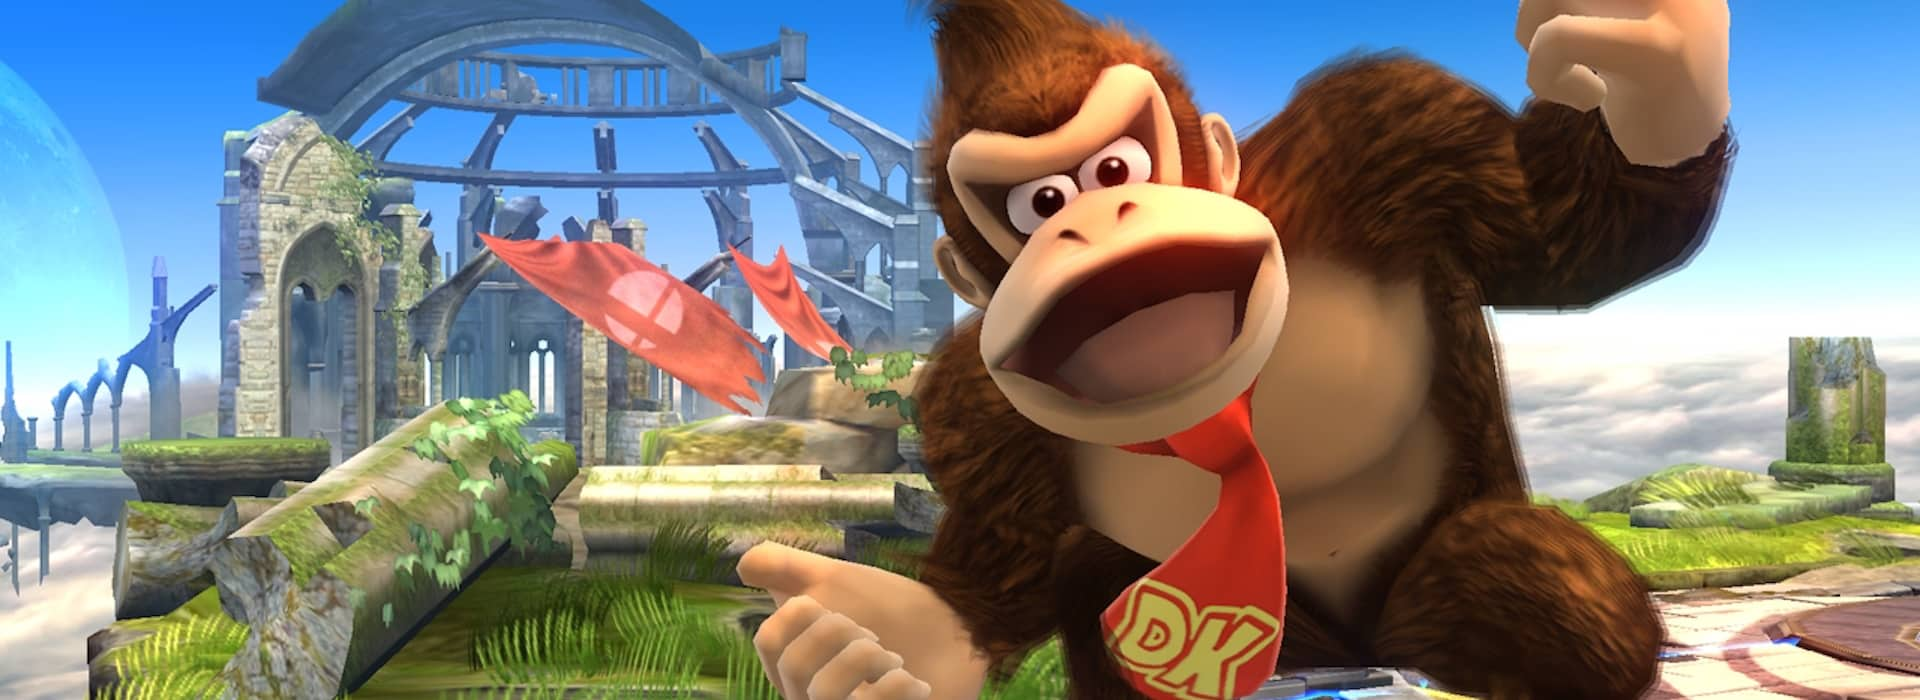 donkey-kong-super-smash-bros-for-wii-u